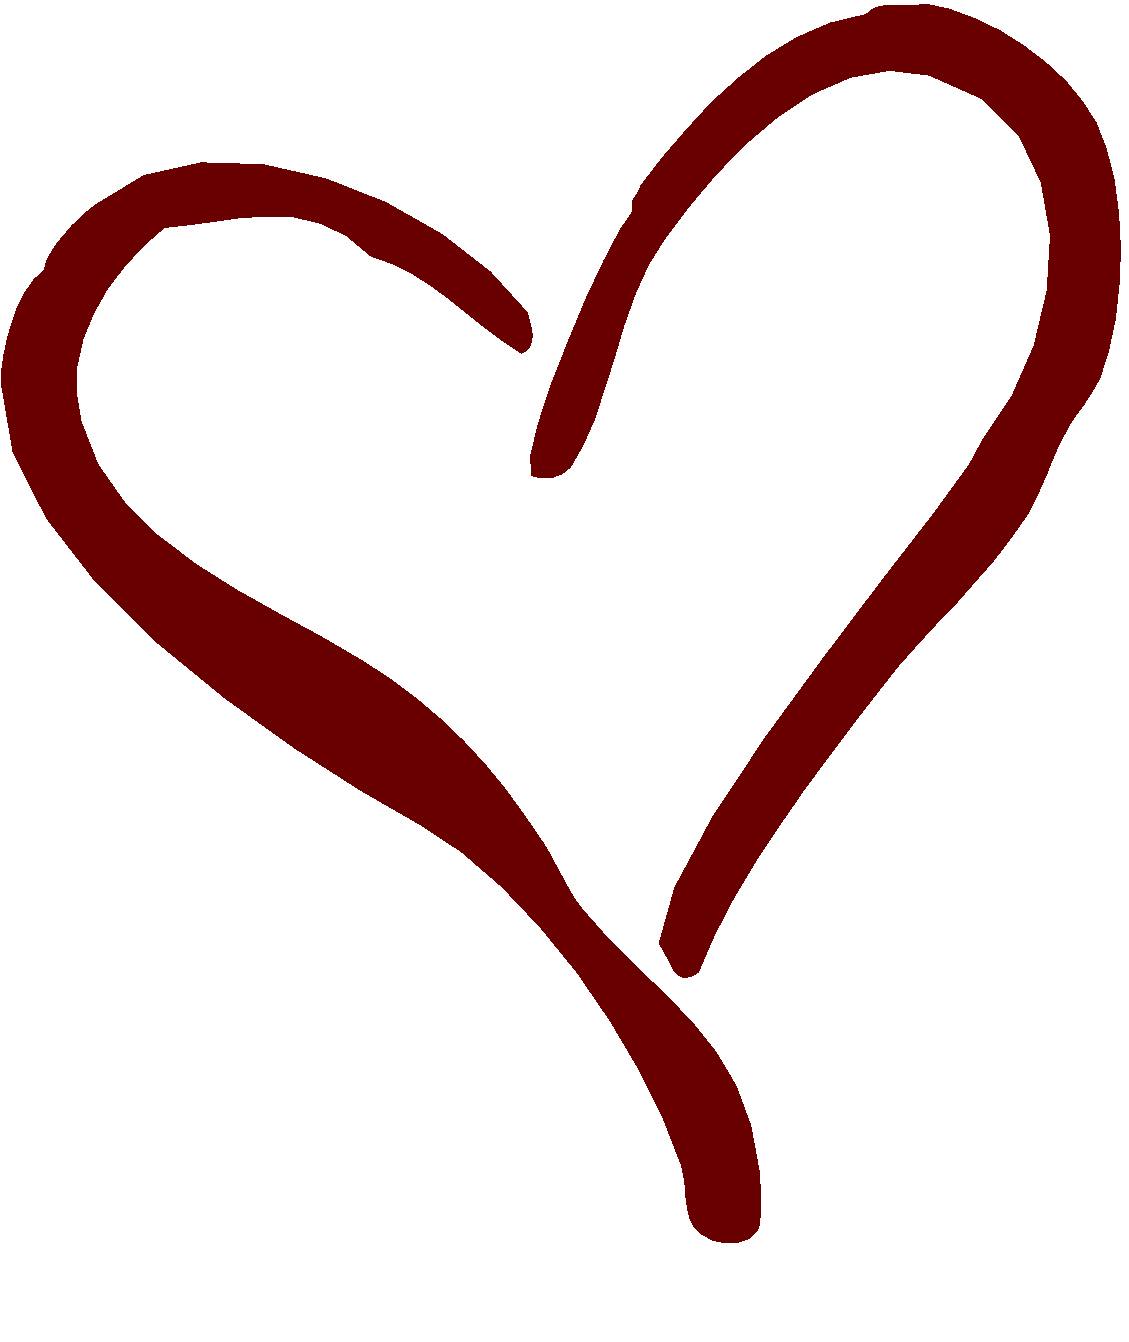 Free Heart Pics, Download Free Clip Art, Free Clip Art on.